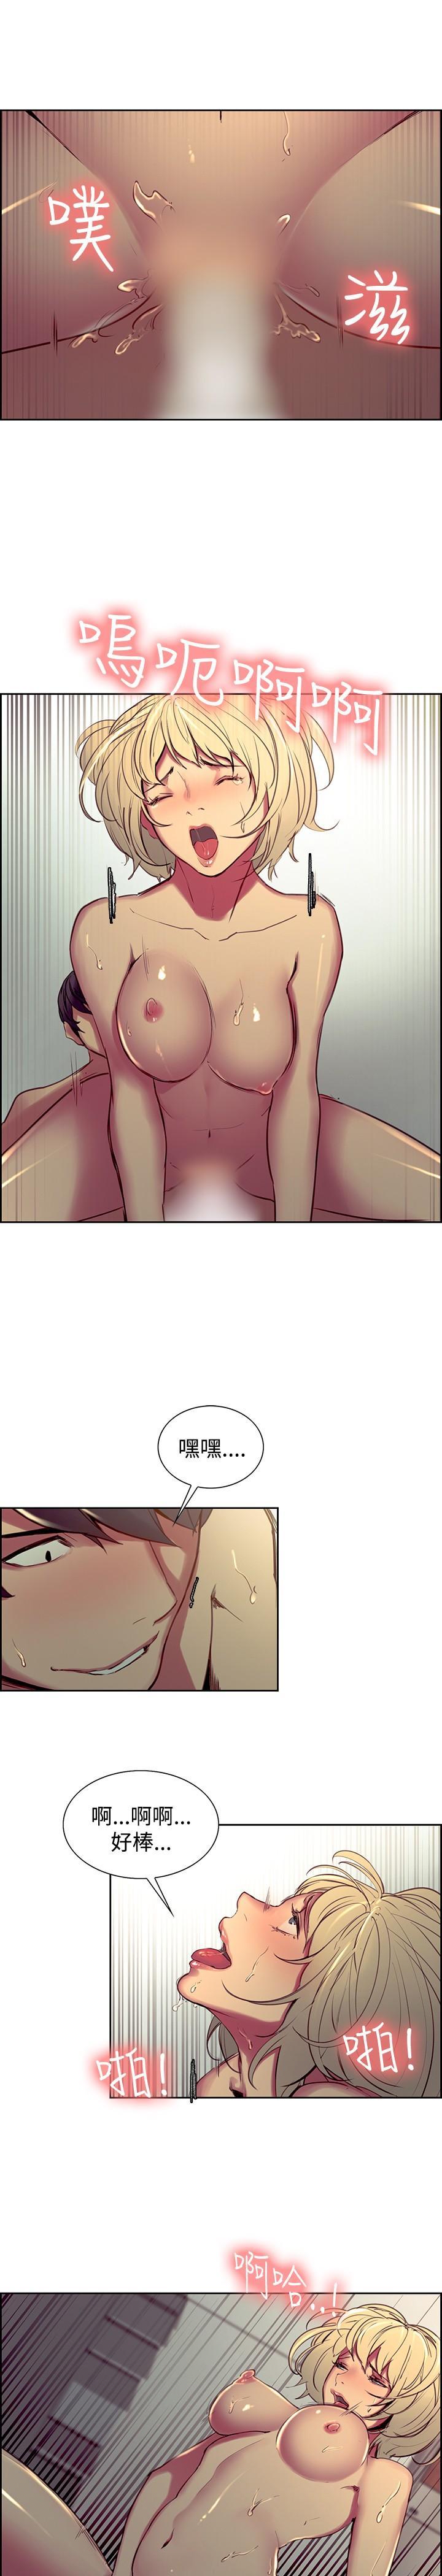 Domesticate the Housekeeper 调教家政妇 ch.29-32 14